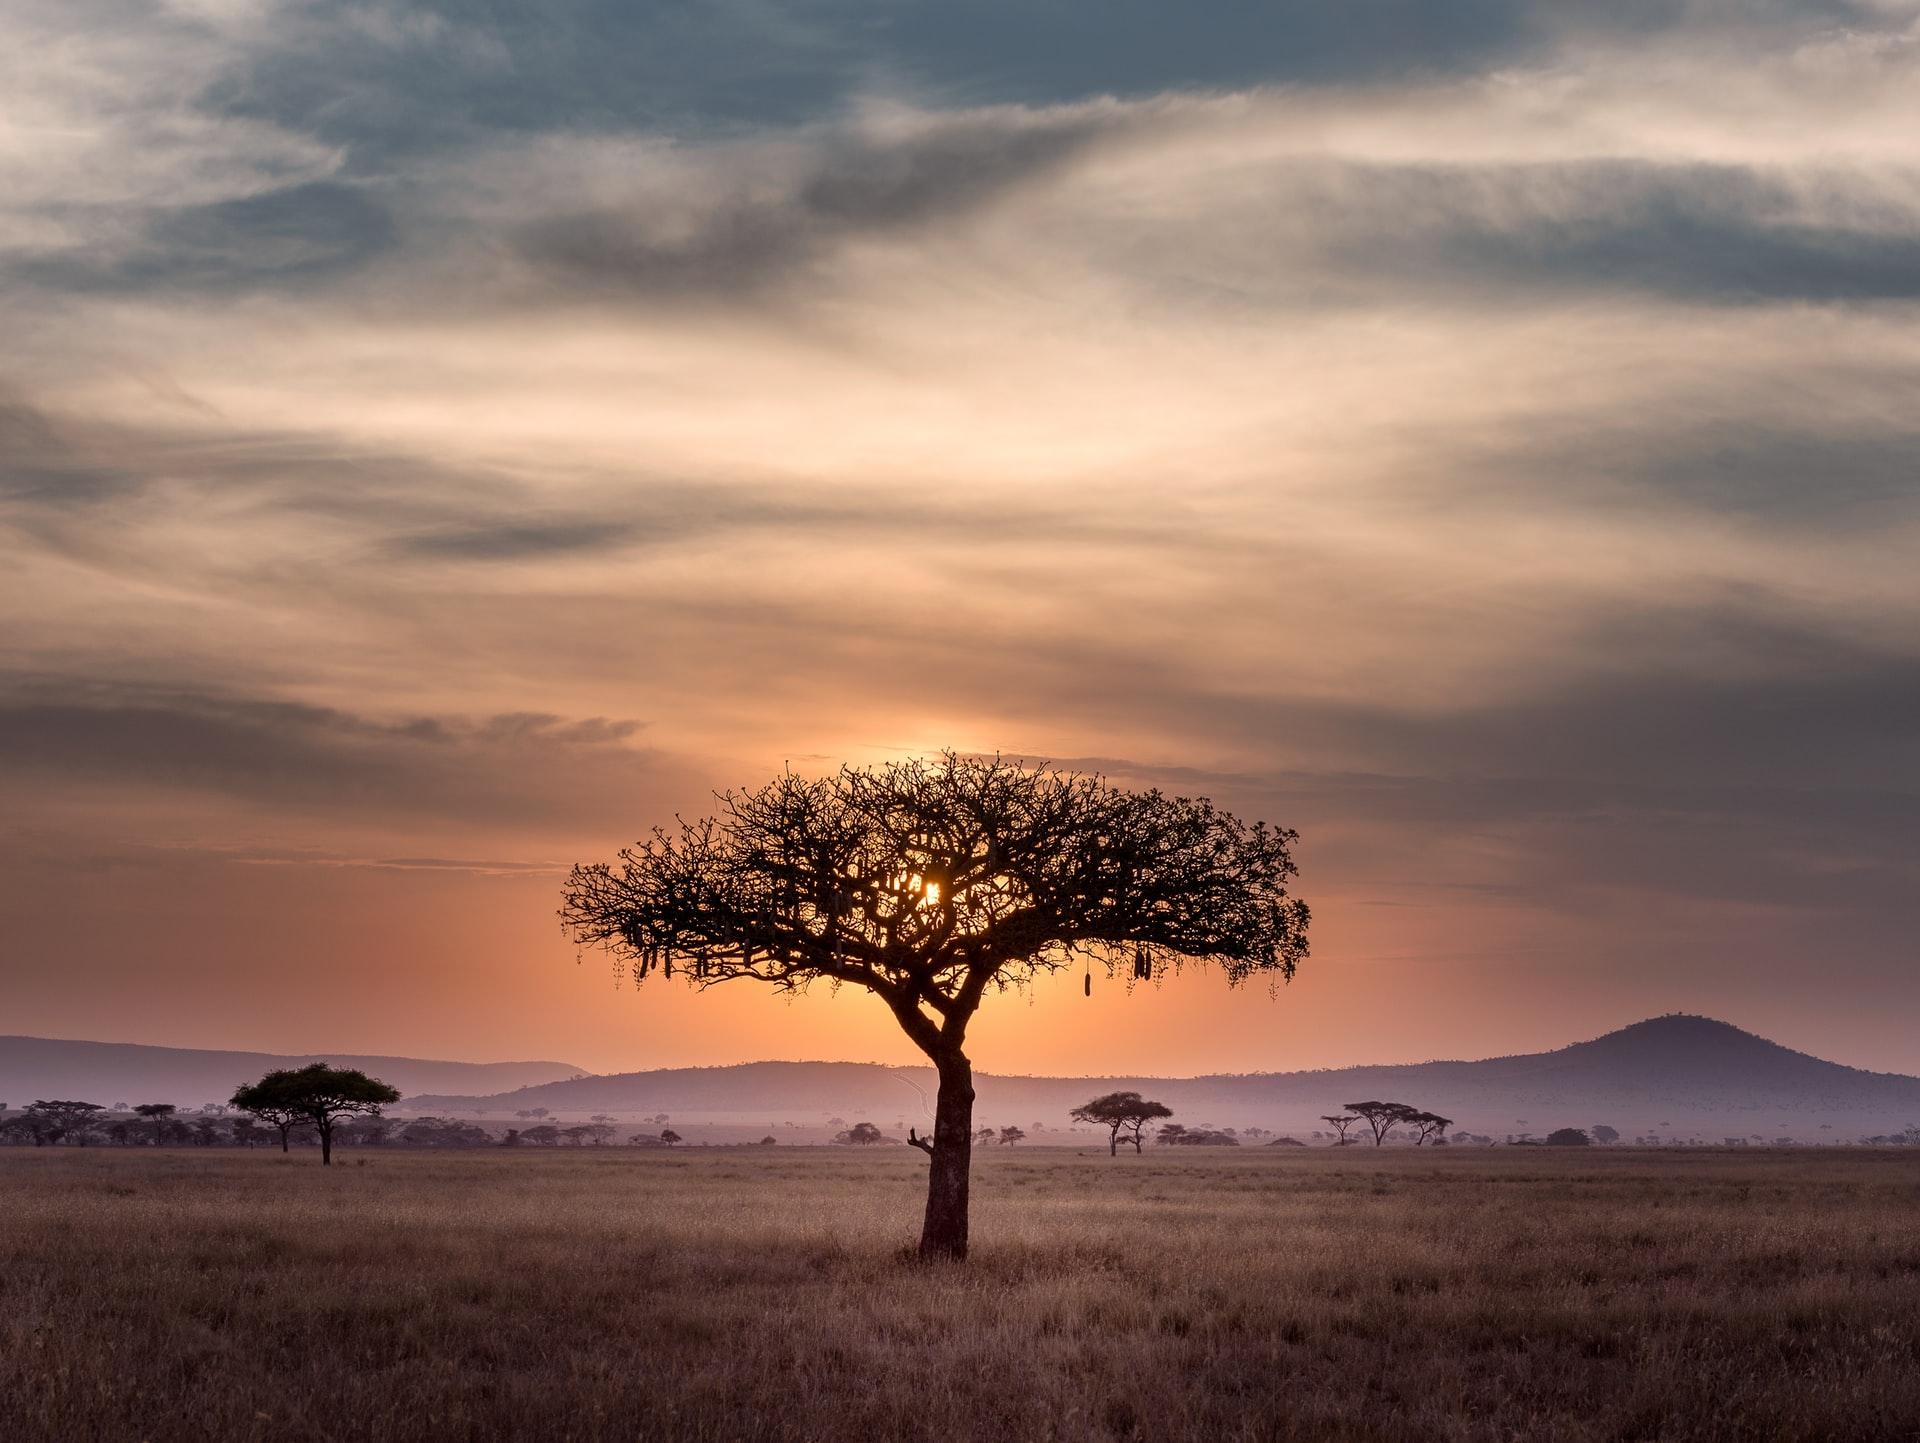 South Africa savannah view night nature